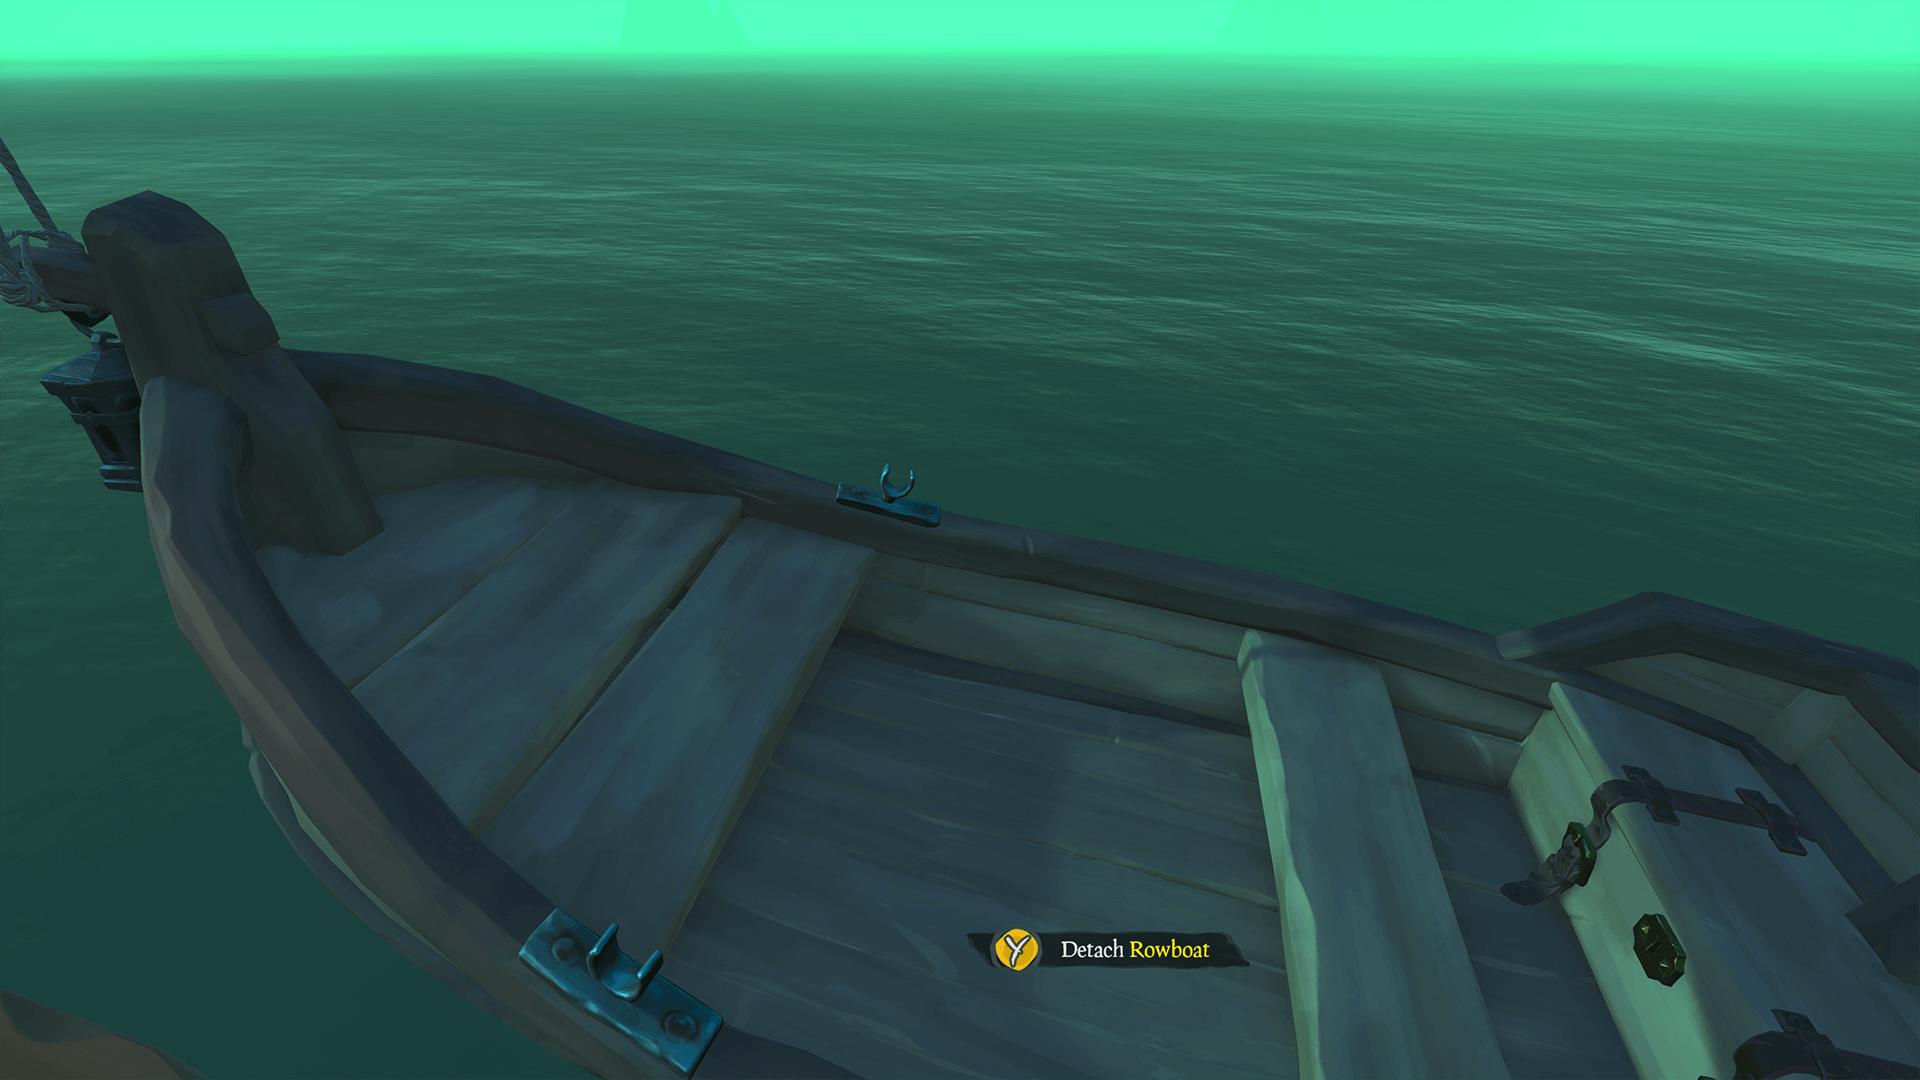 Detach Rowboat